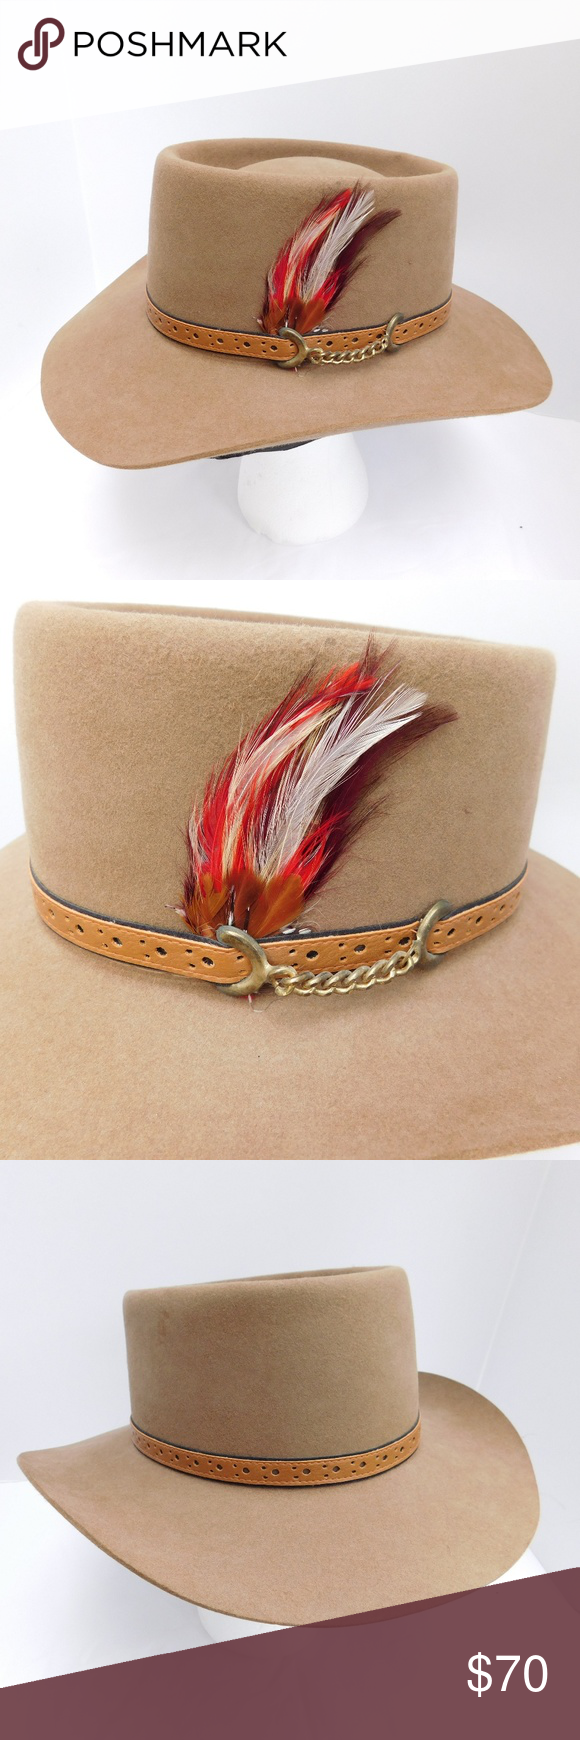 Vintage Akubra Australia Cowboy Hat Brand Akubra Color Tan Brown Material Felt Fur Feather Style Hat Features Brass Cowboy Hats Cowboy Hat Brands Cowboy